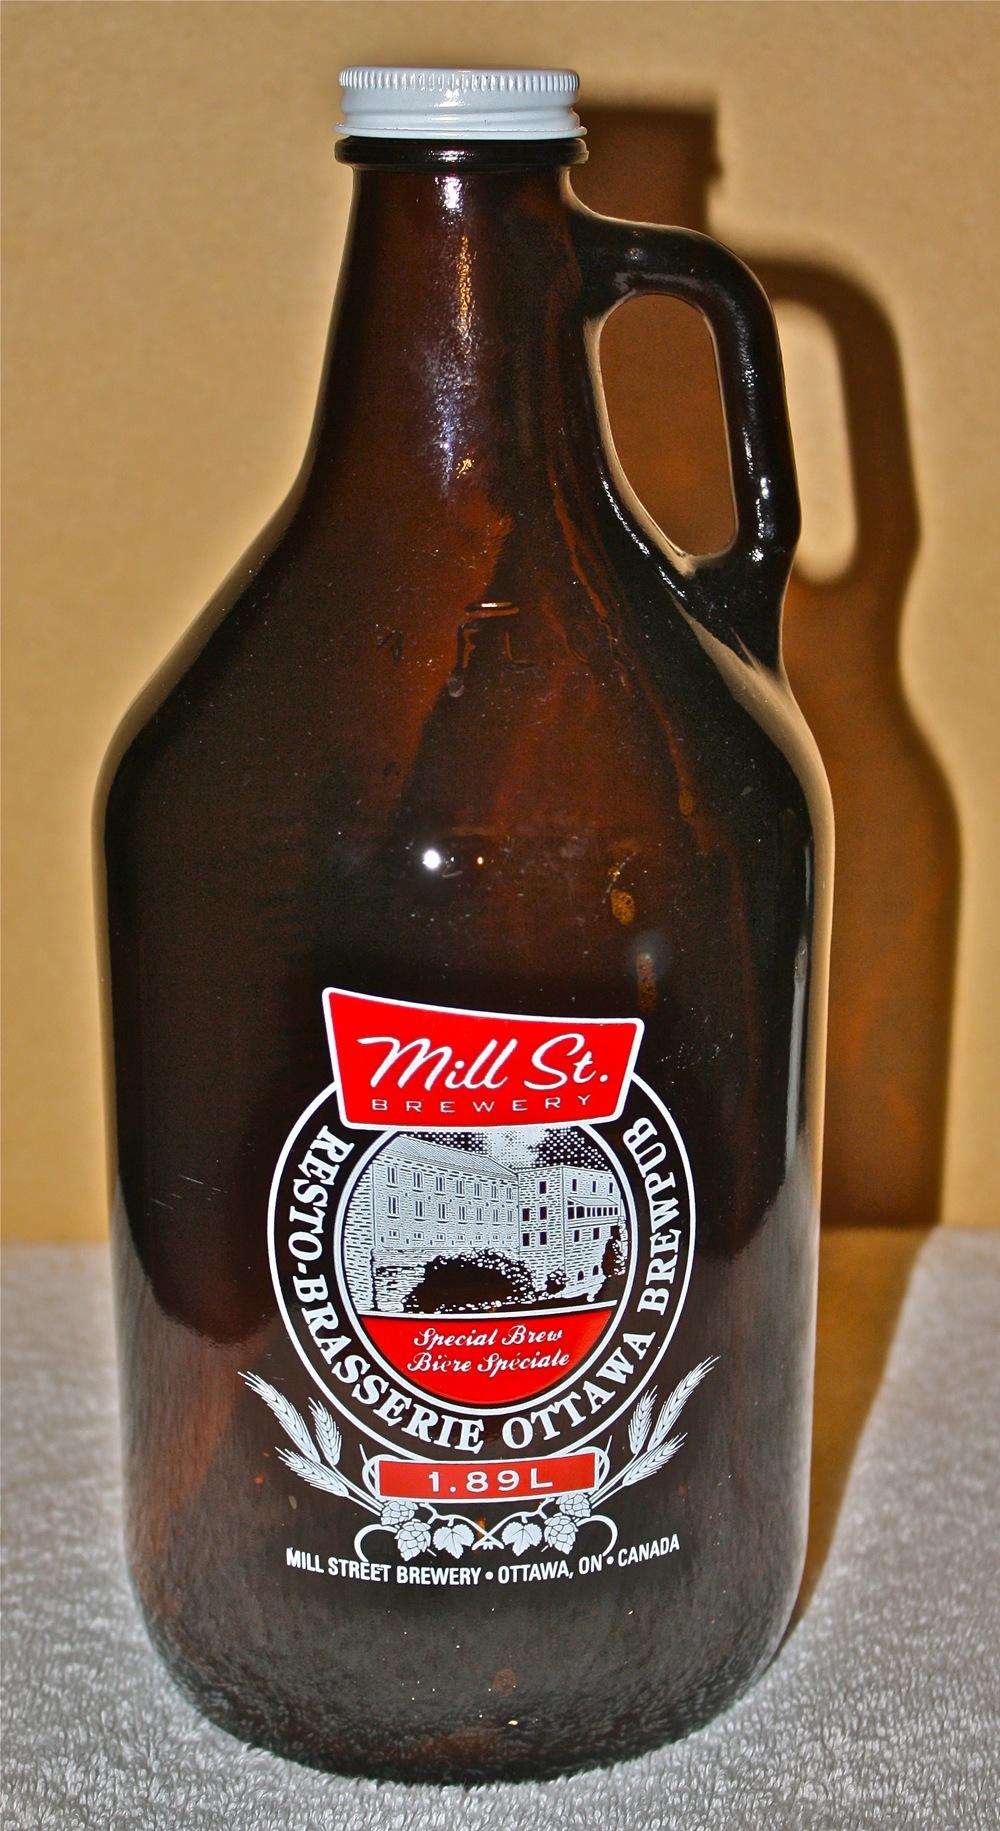 GR - Mill Street Brewery Ottawa (ON).jpg